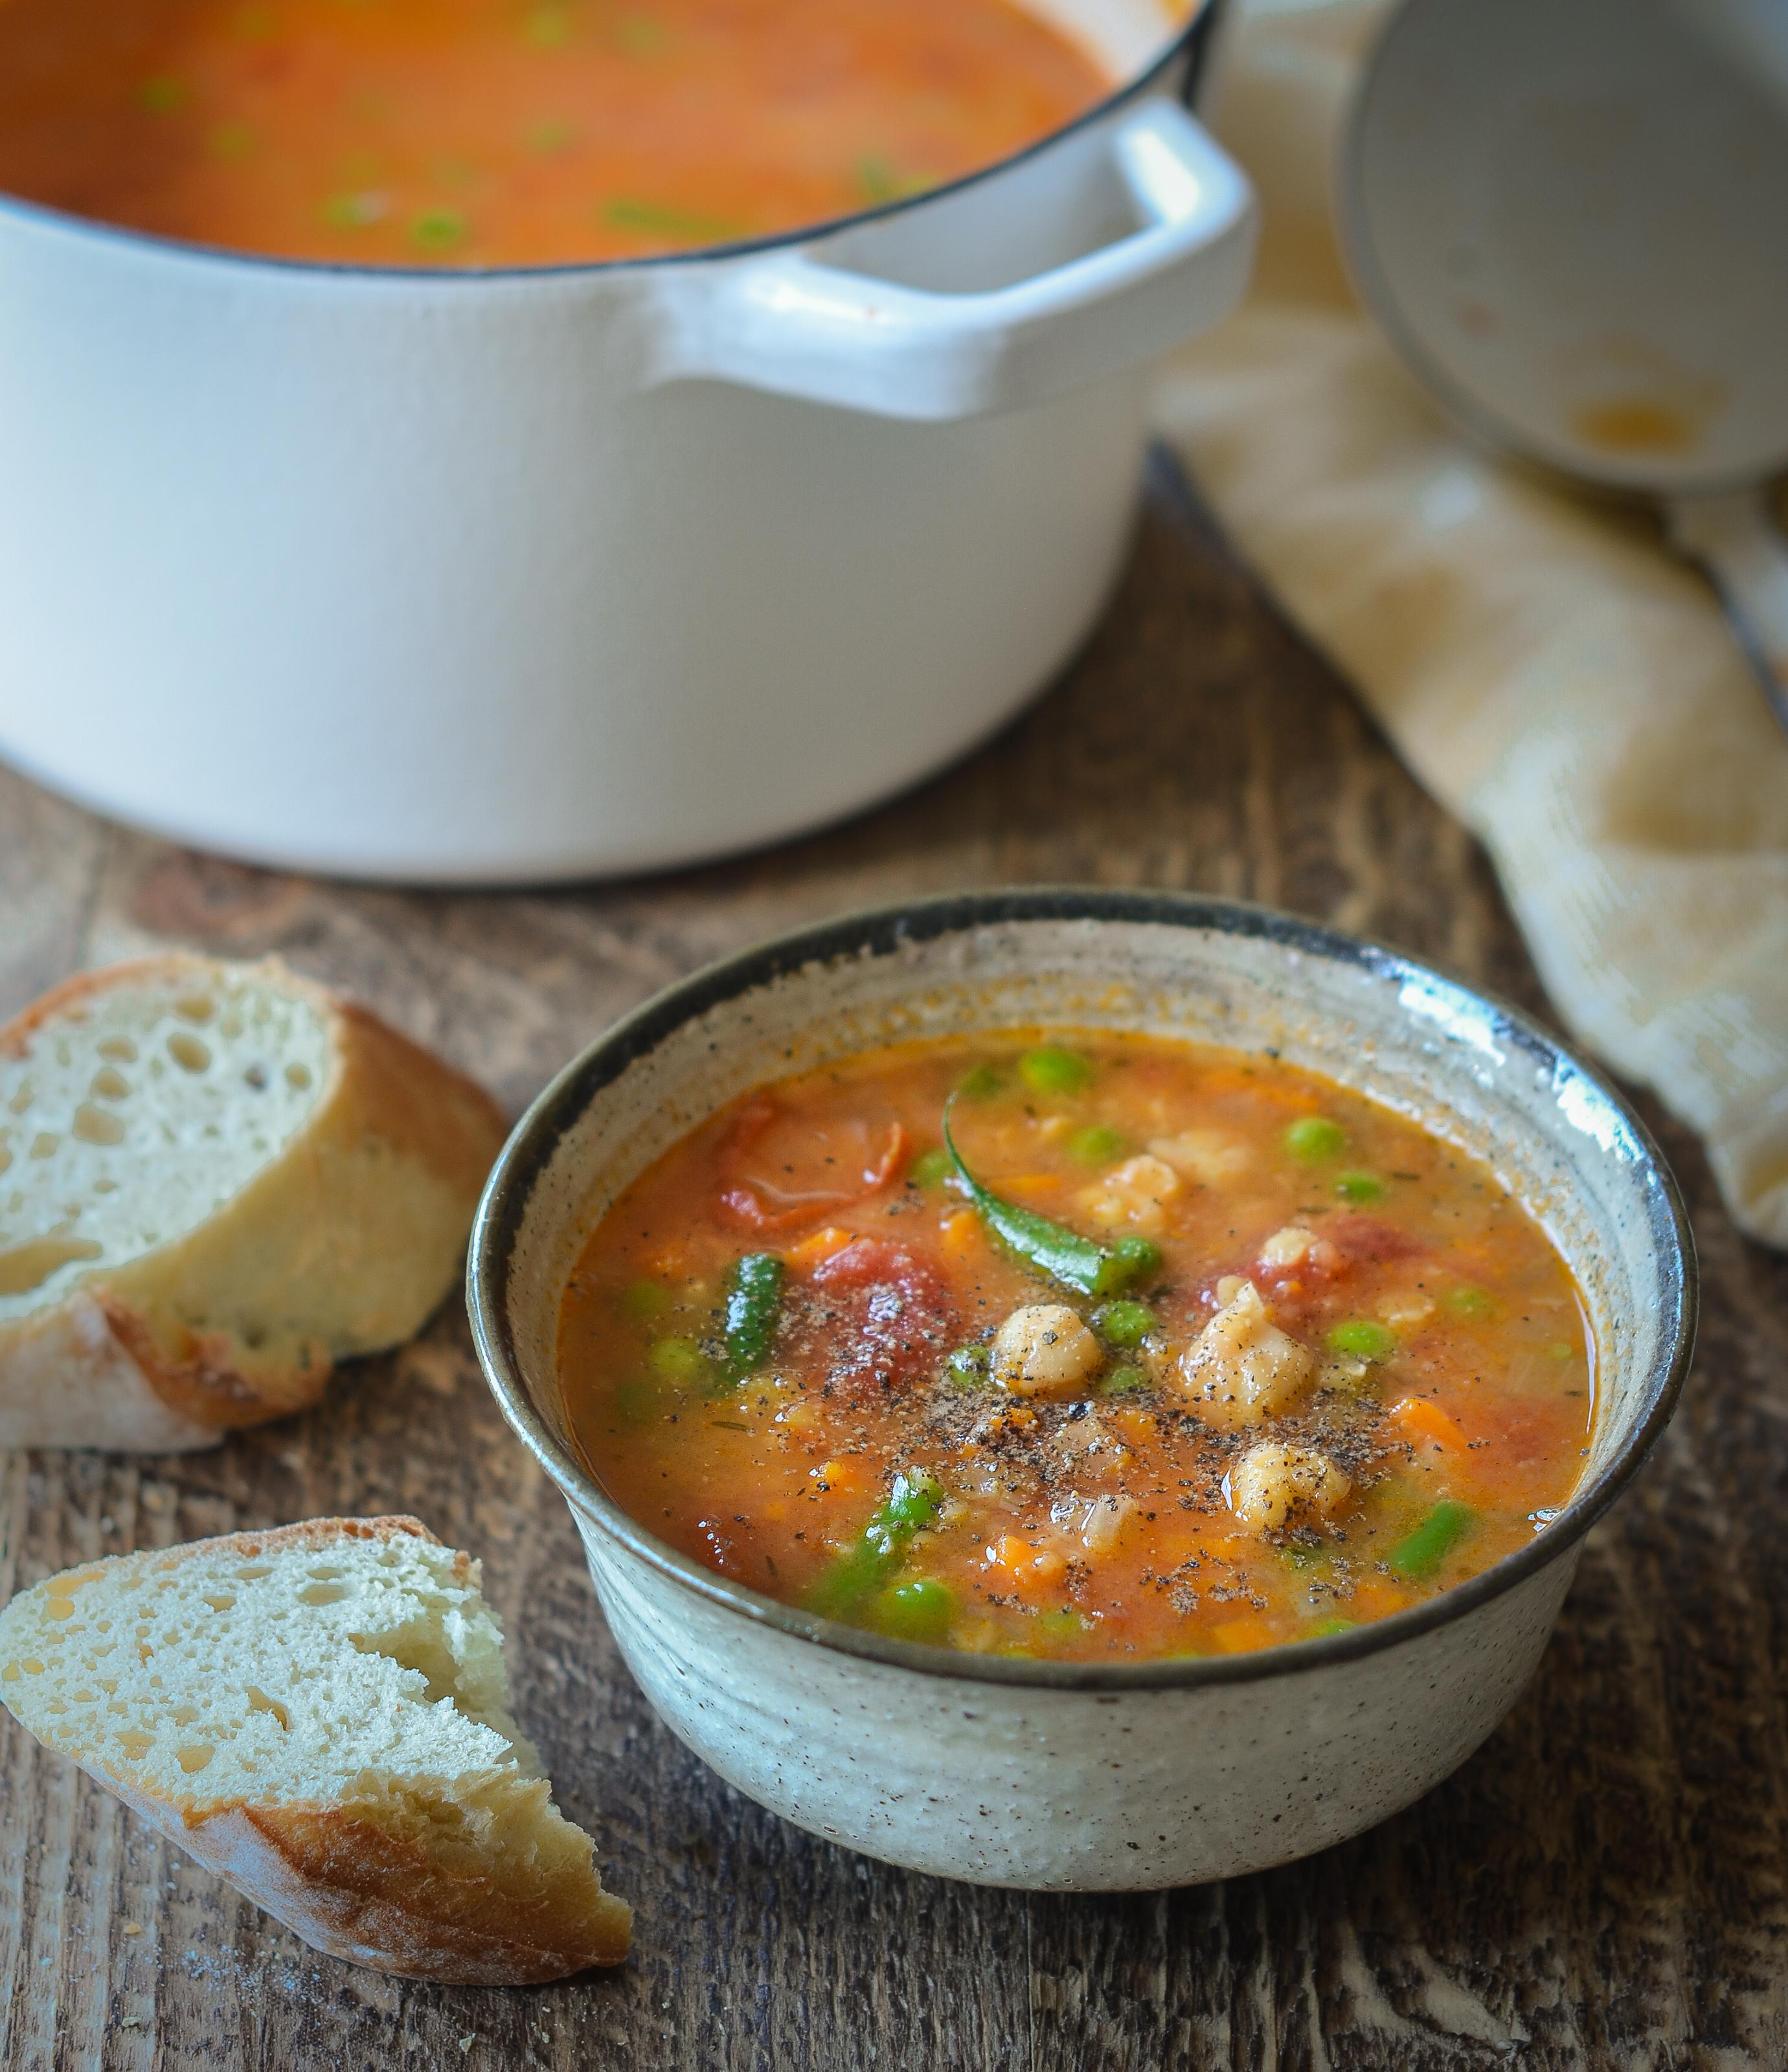 Smoky Chickpea Red Lentil Vegetable Soup